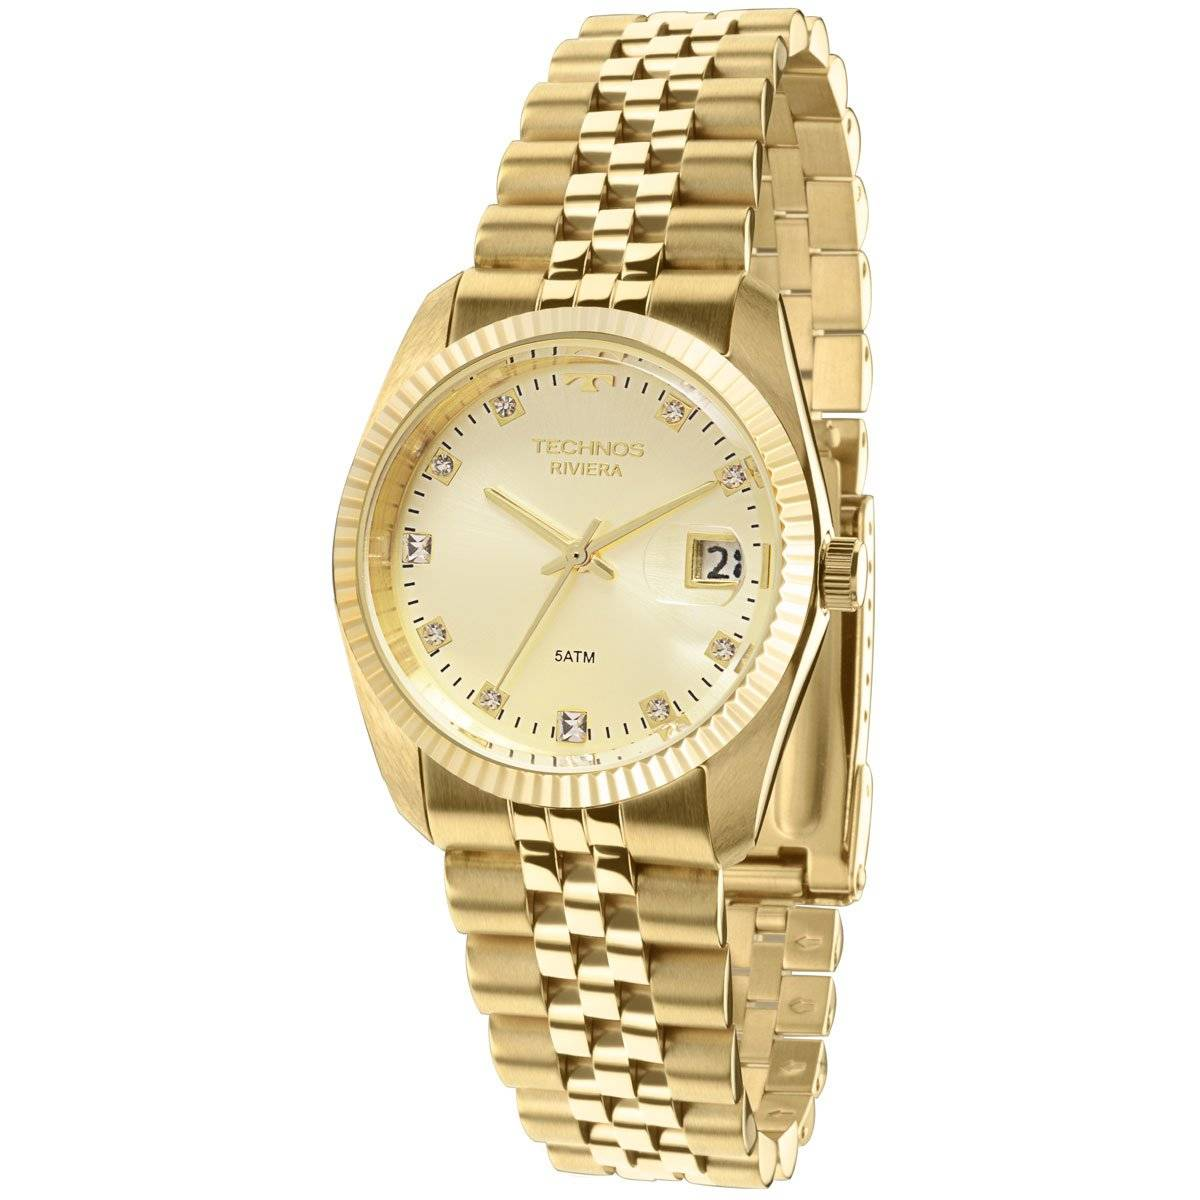 Relógio Technos Classic Riviera Feminino Quartz GM10YB/4X